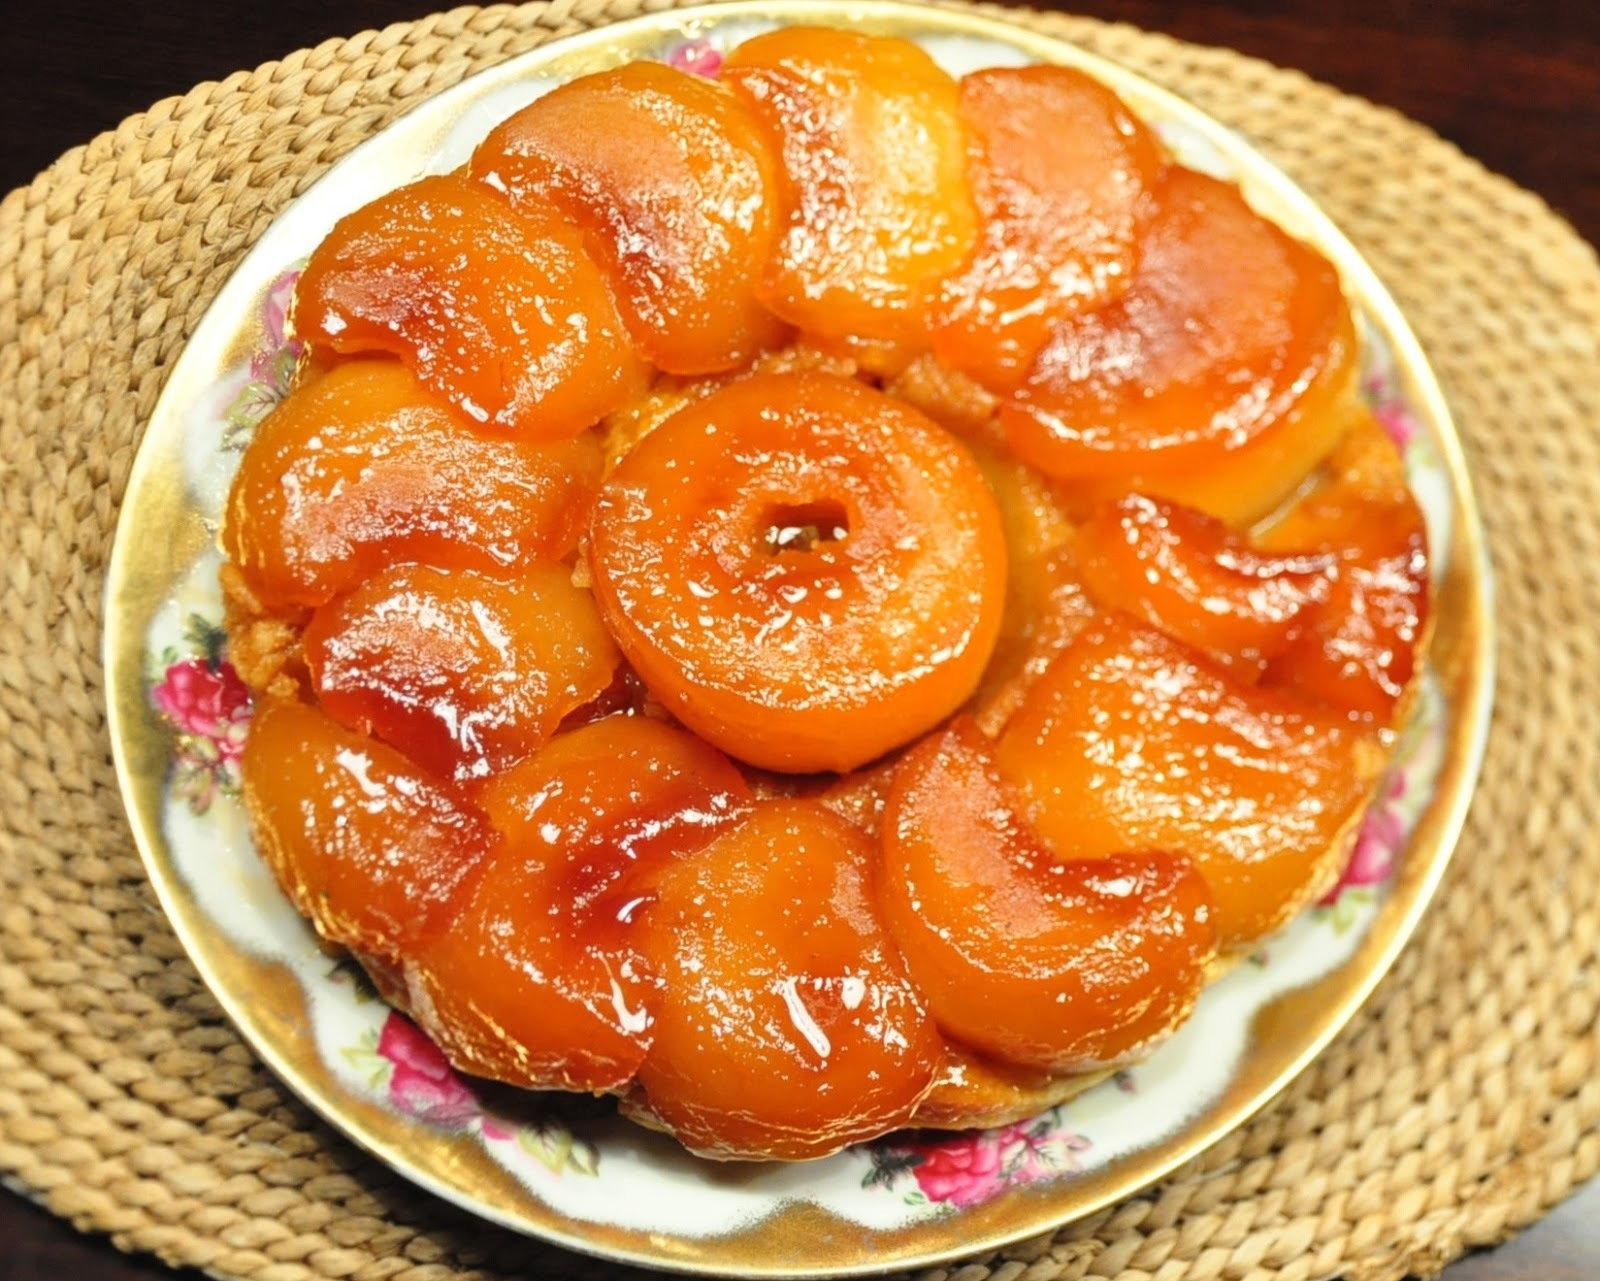 torta invertida de manzana ariel rodriguez palacios